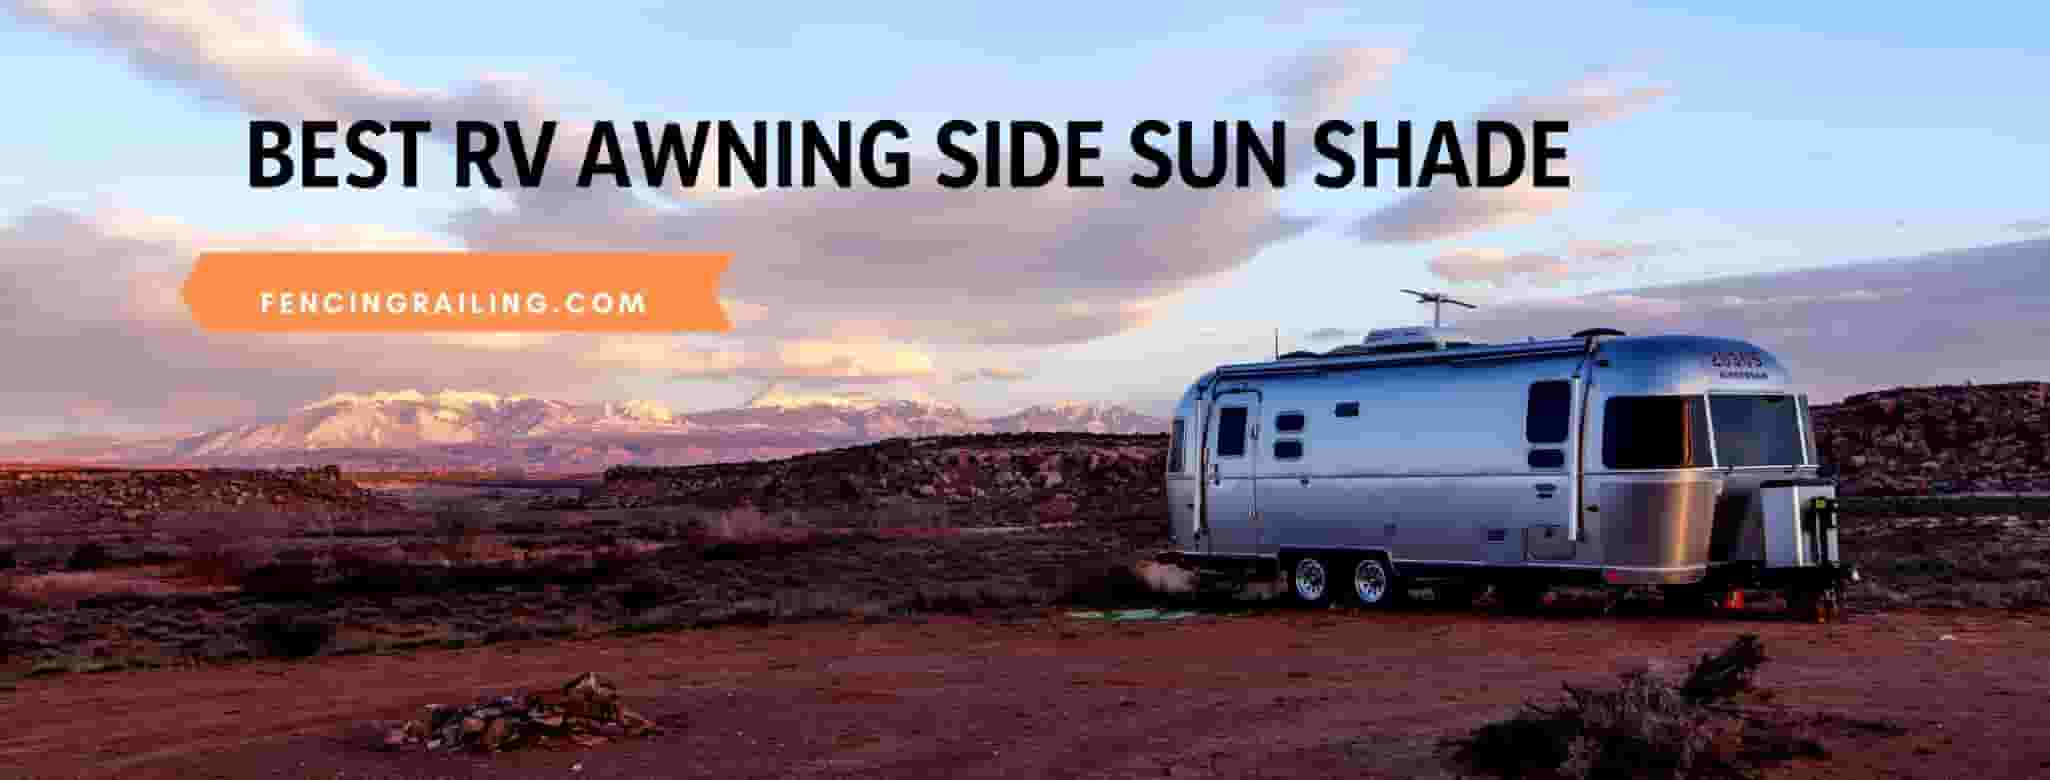 rv awning sun shade reviews